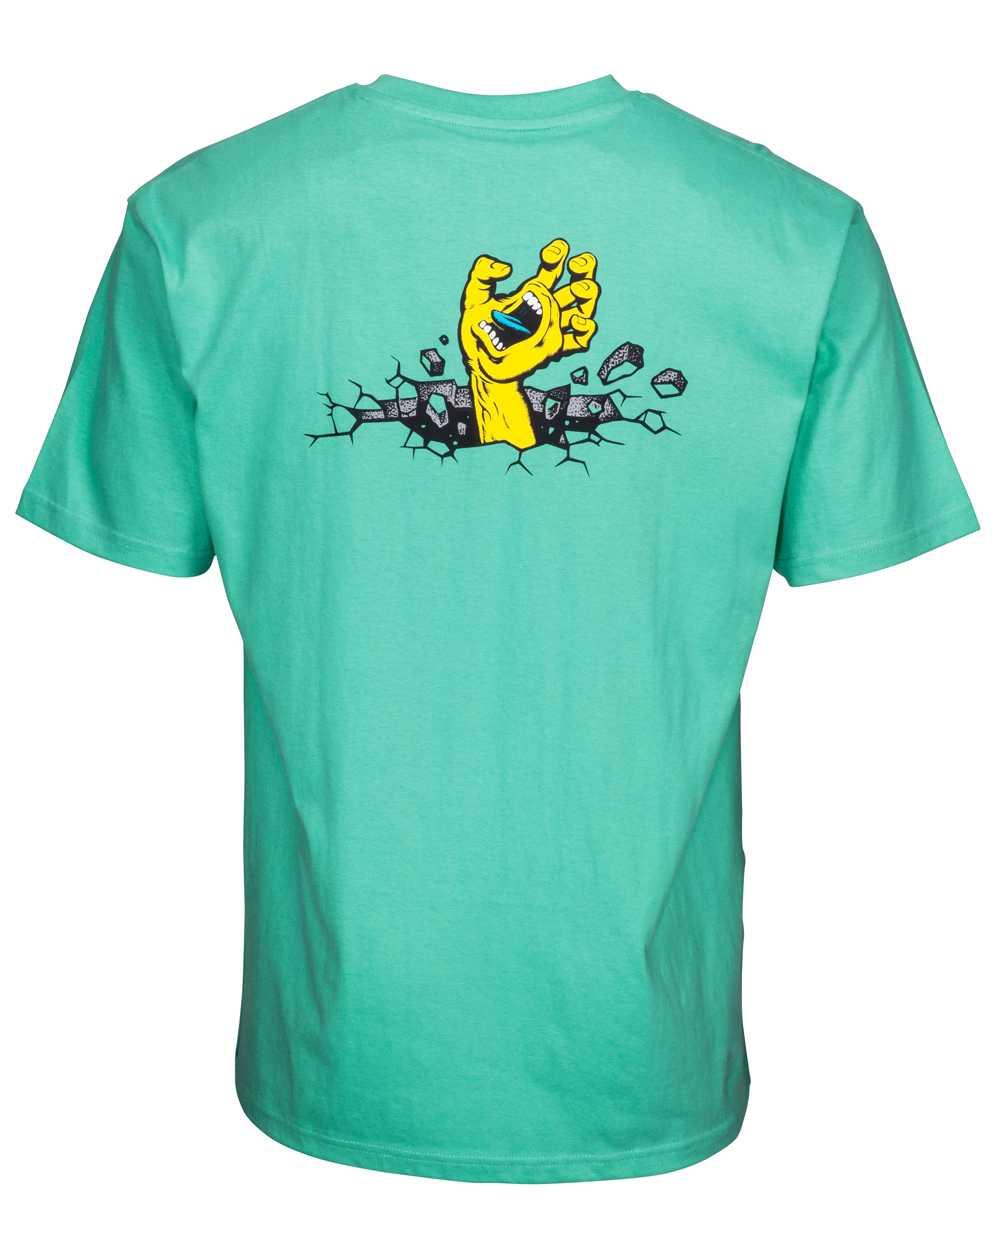 Santa Cruz Hand Wall T-Shirt Homme Spearmint